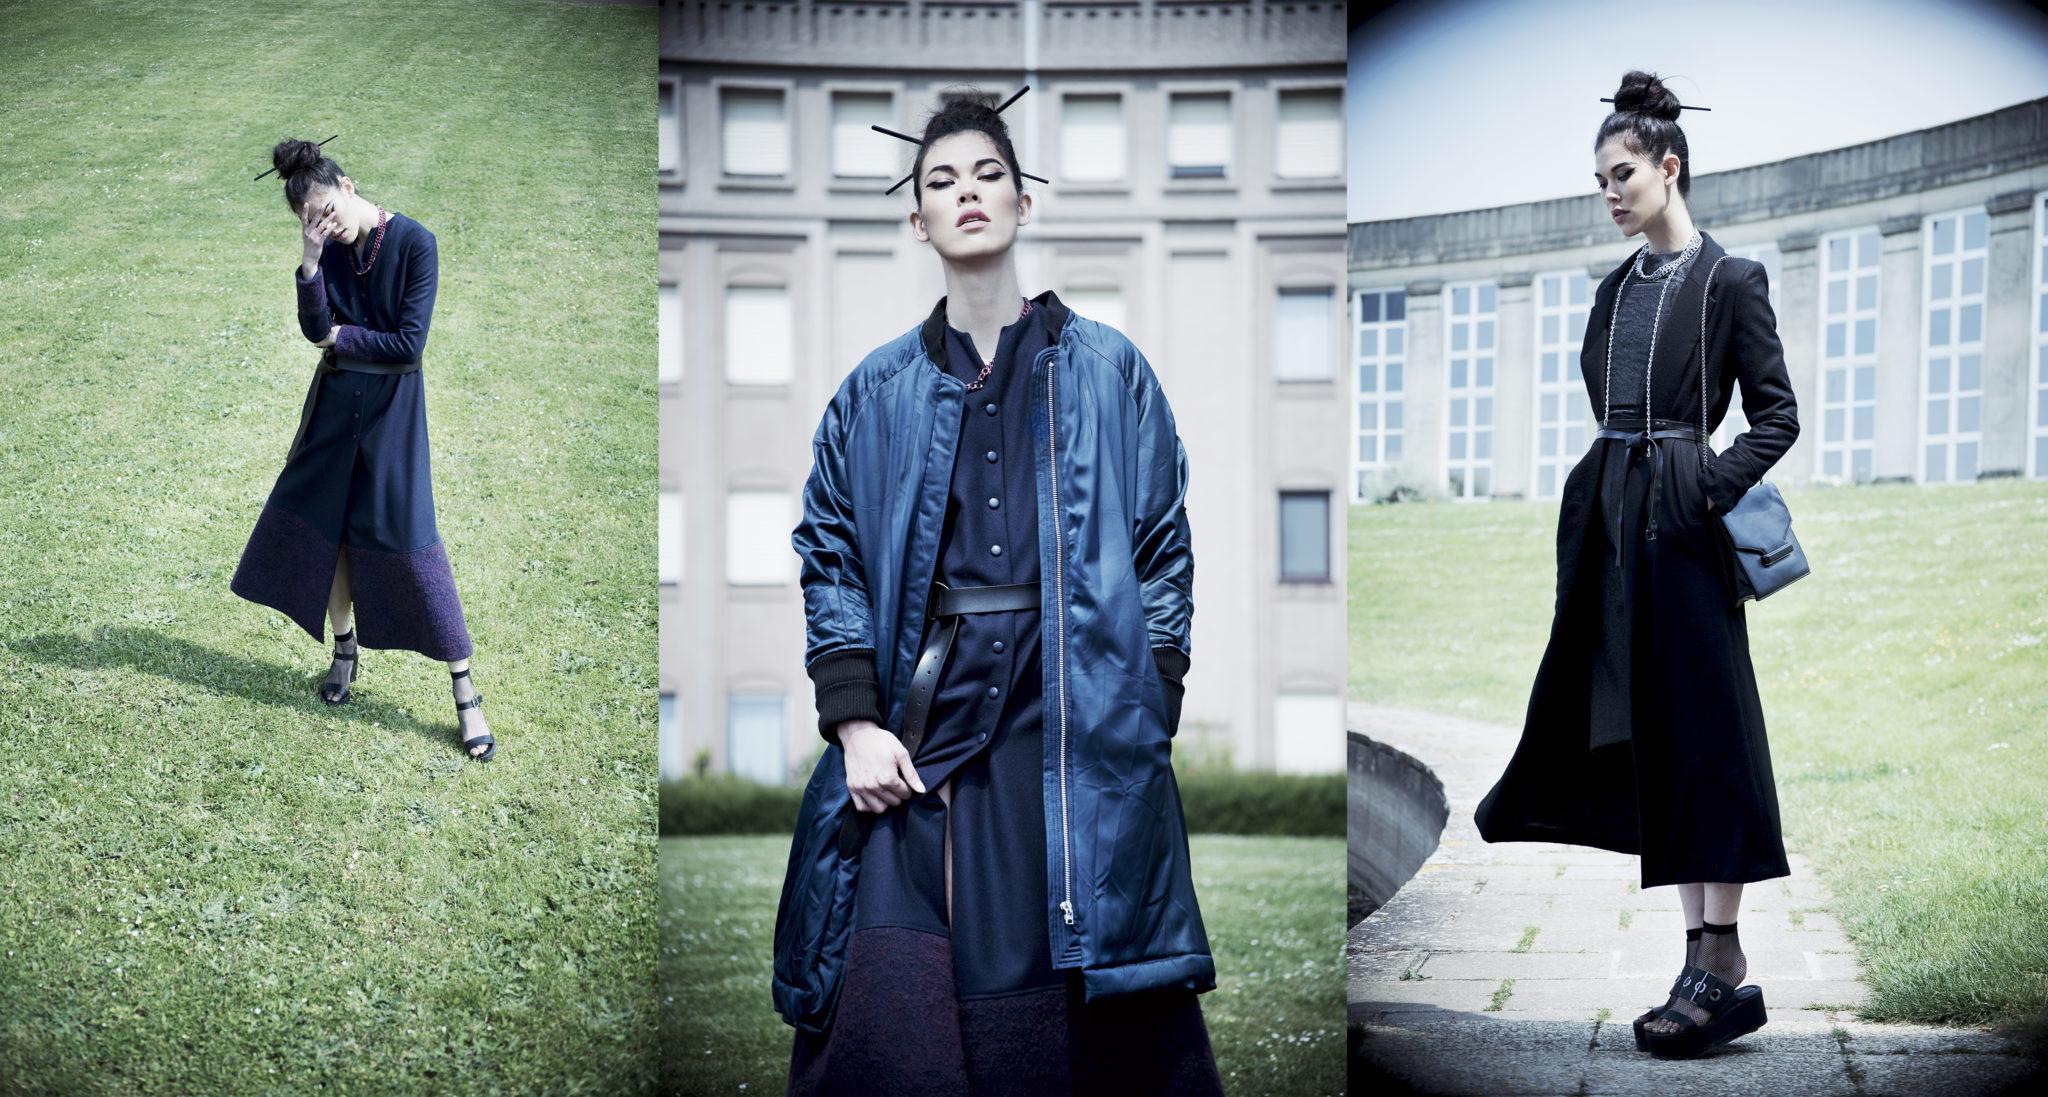 le rivage fashion story edito editorial webditorial le dernier etage magazine louis adrien le blay paris